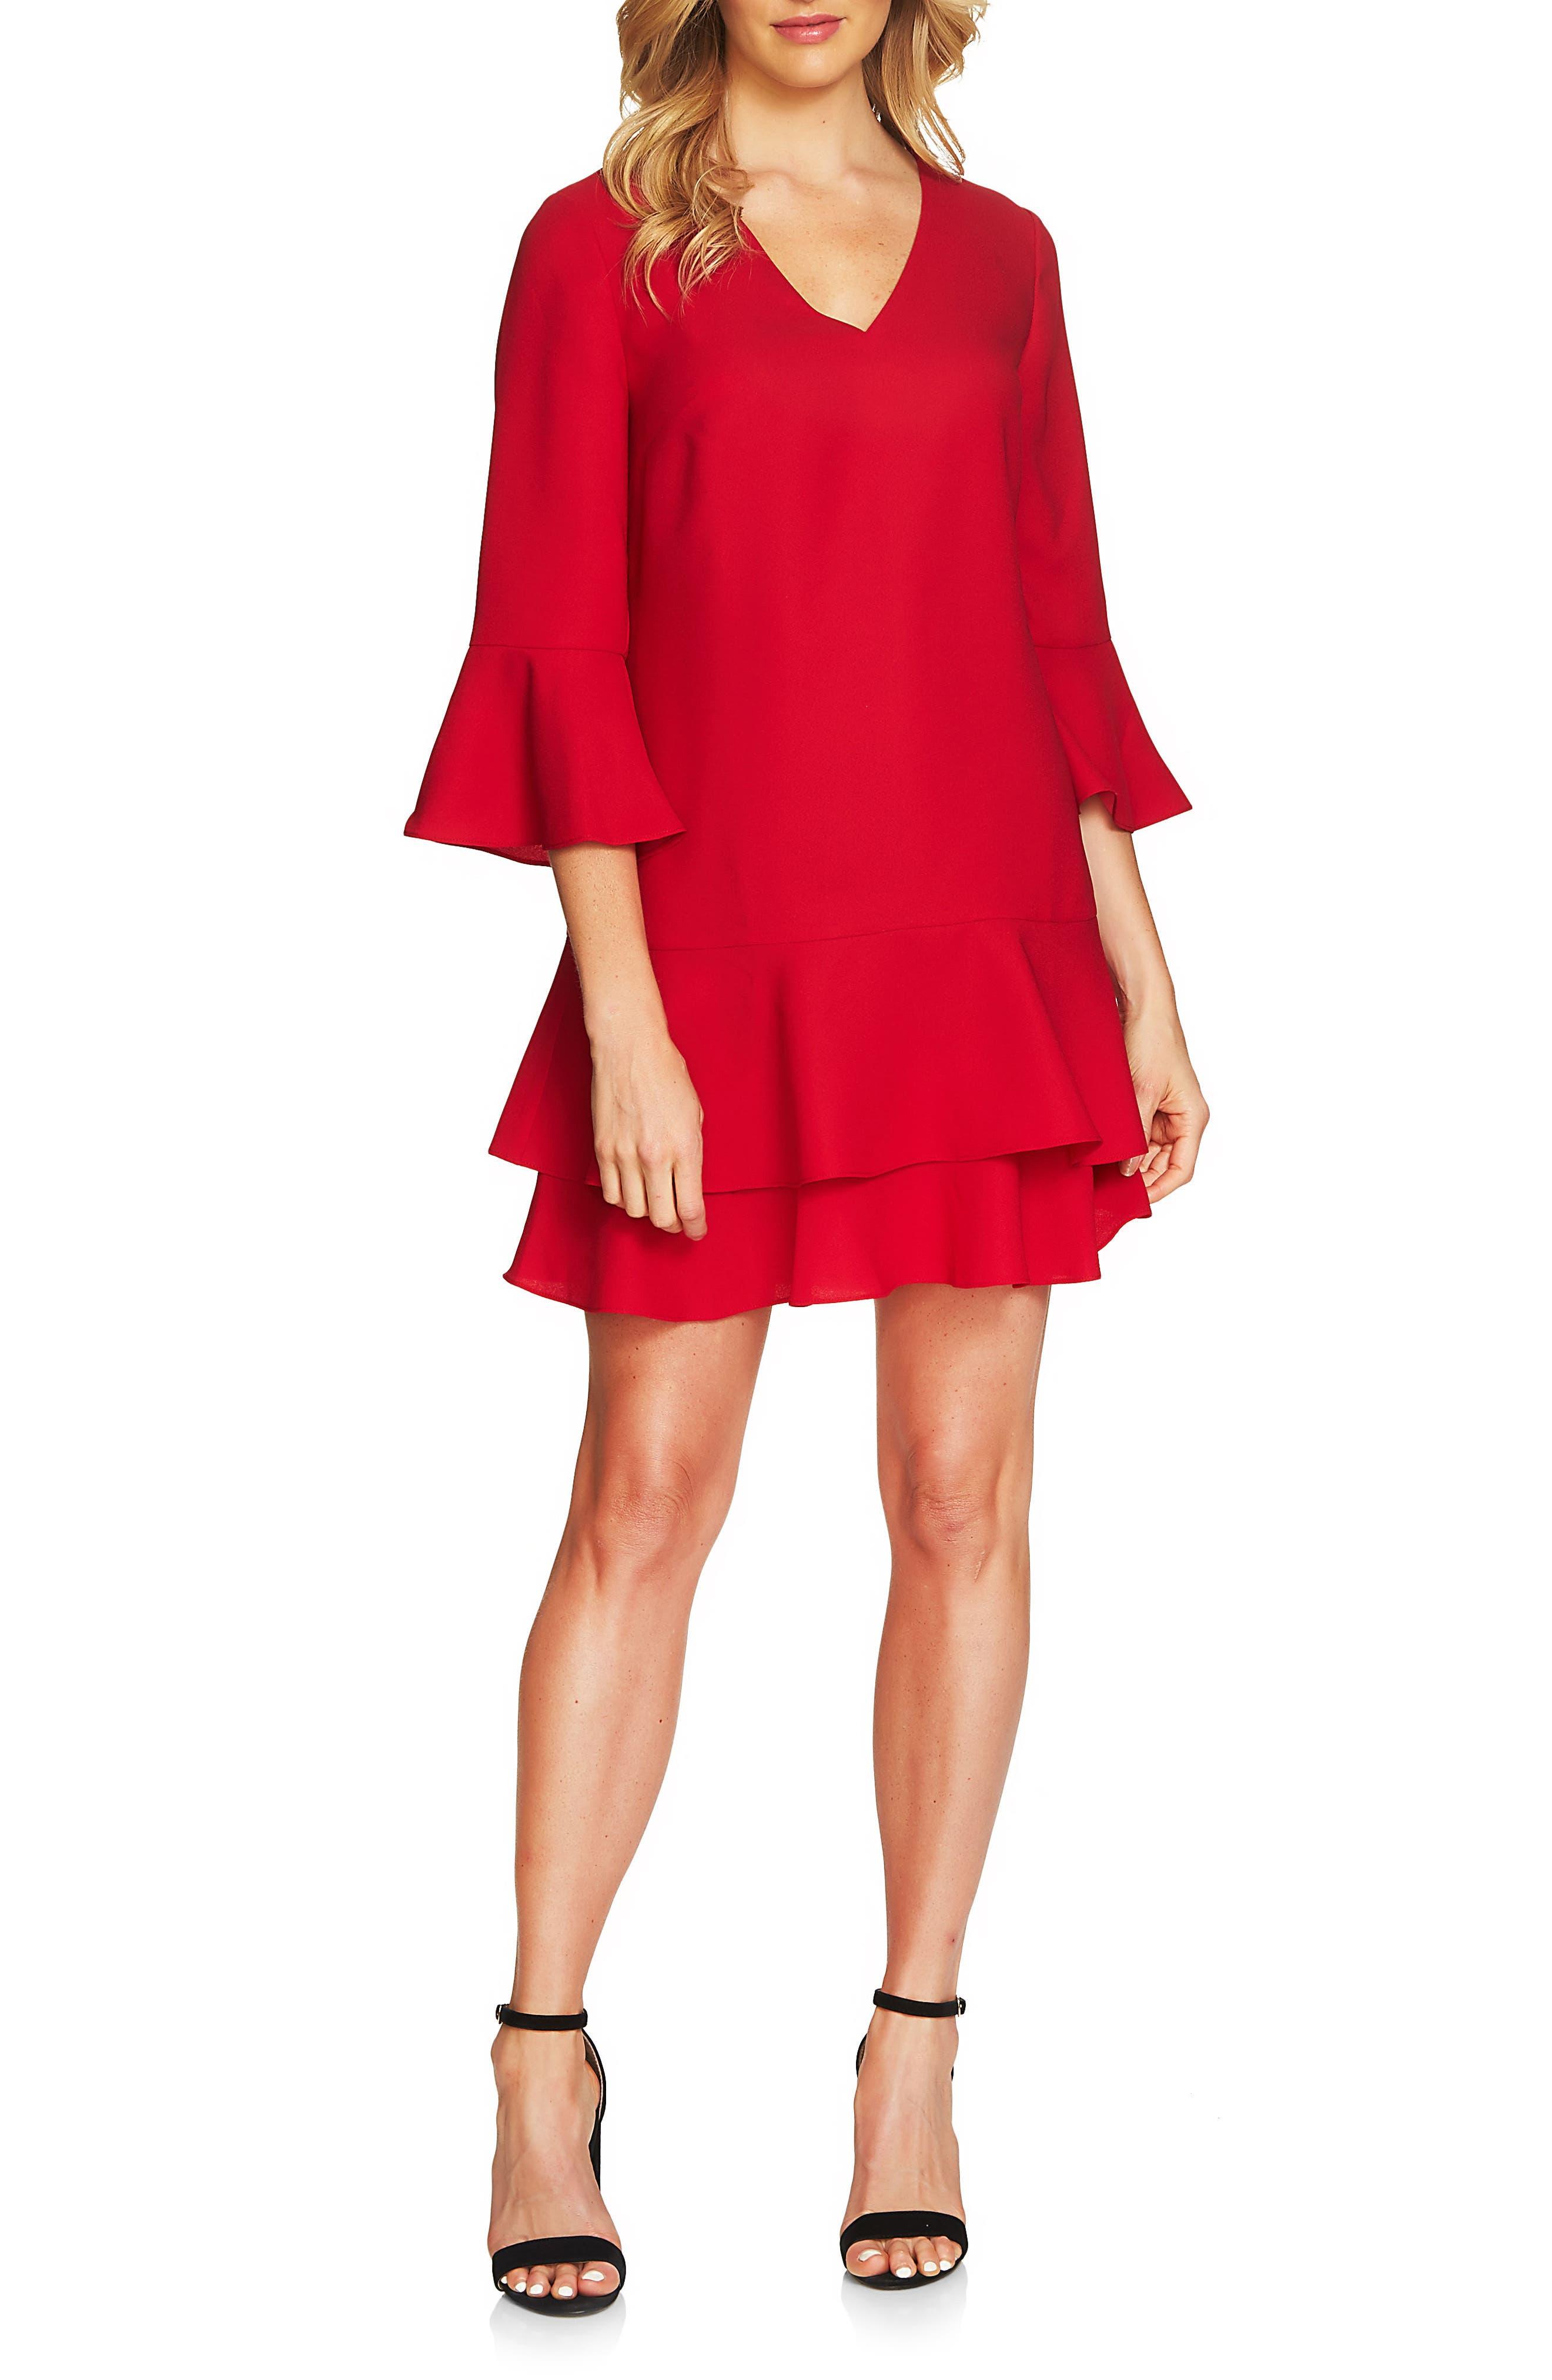 Alternate Image 1 Selected - CeCe Katelyn Ruffle Shift Dress